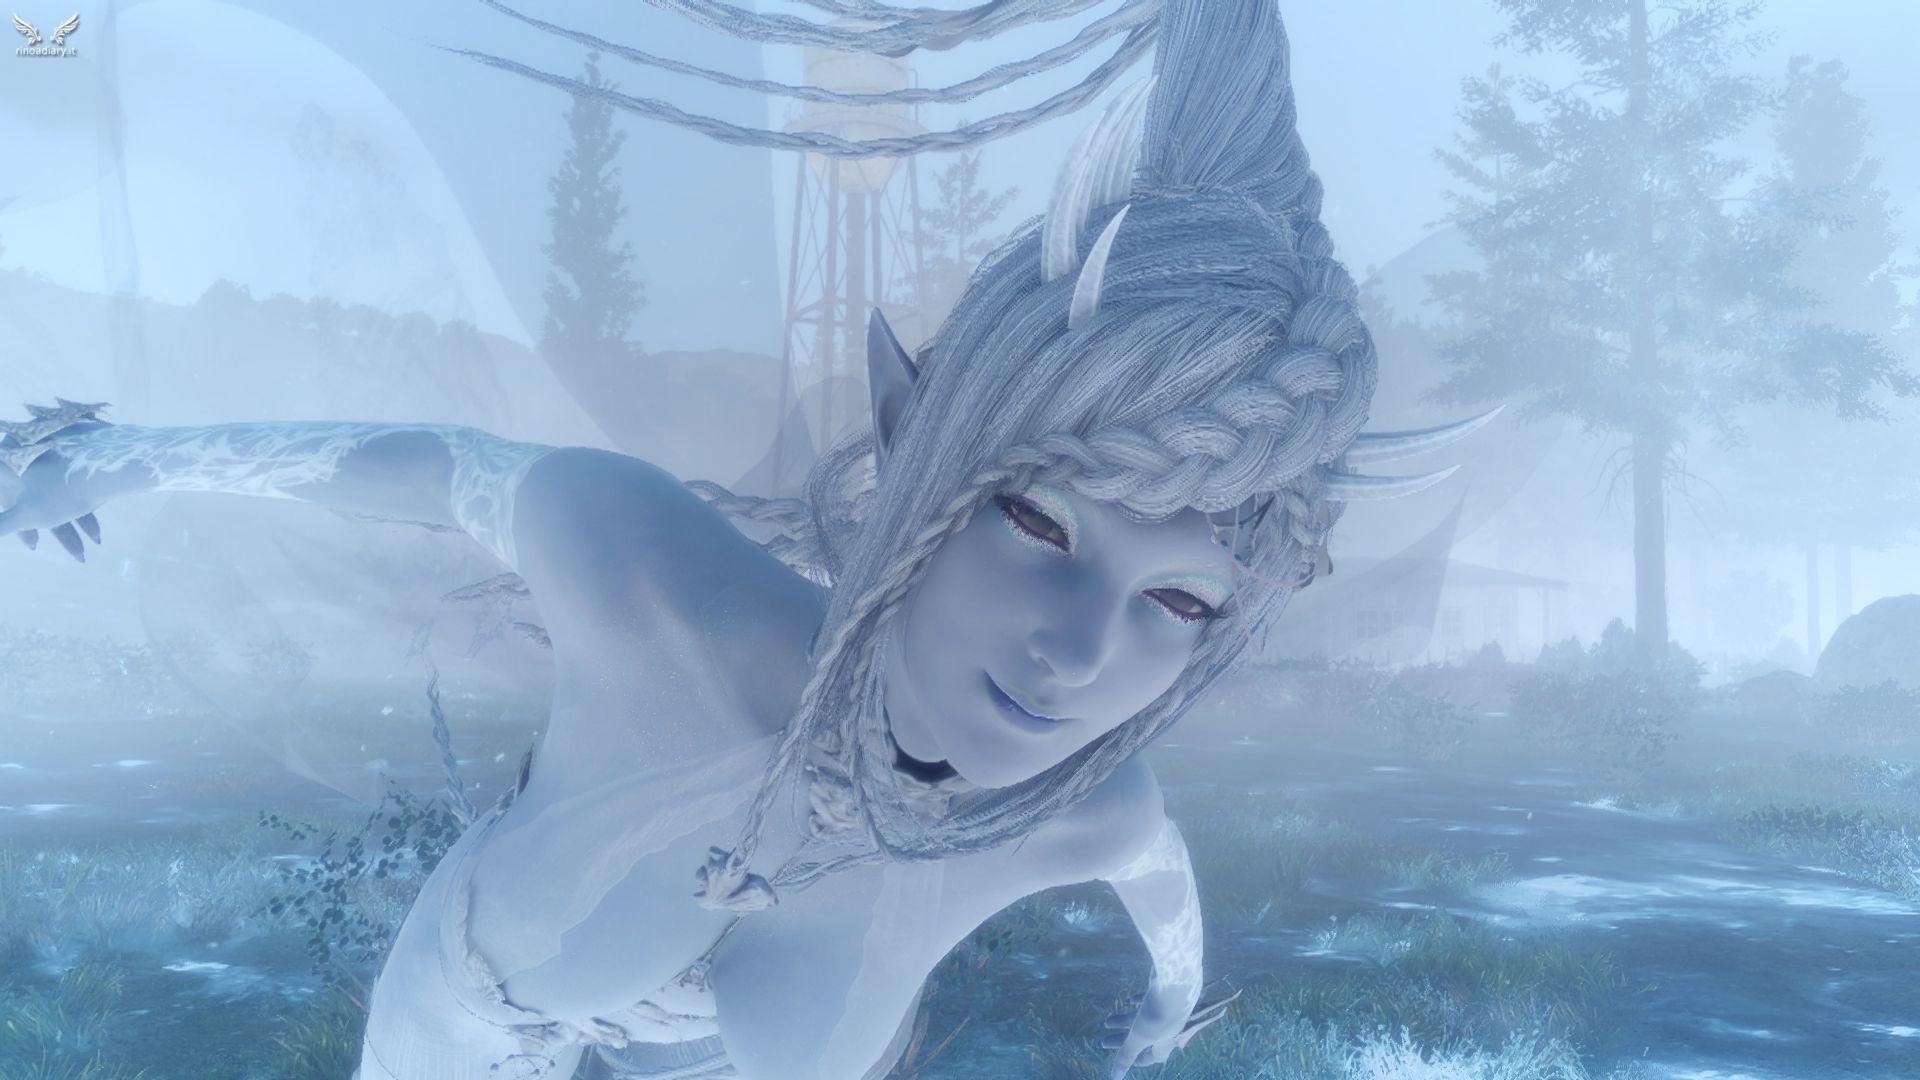 Final Fantasy XV - TGS 2016 - Shiva #1